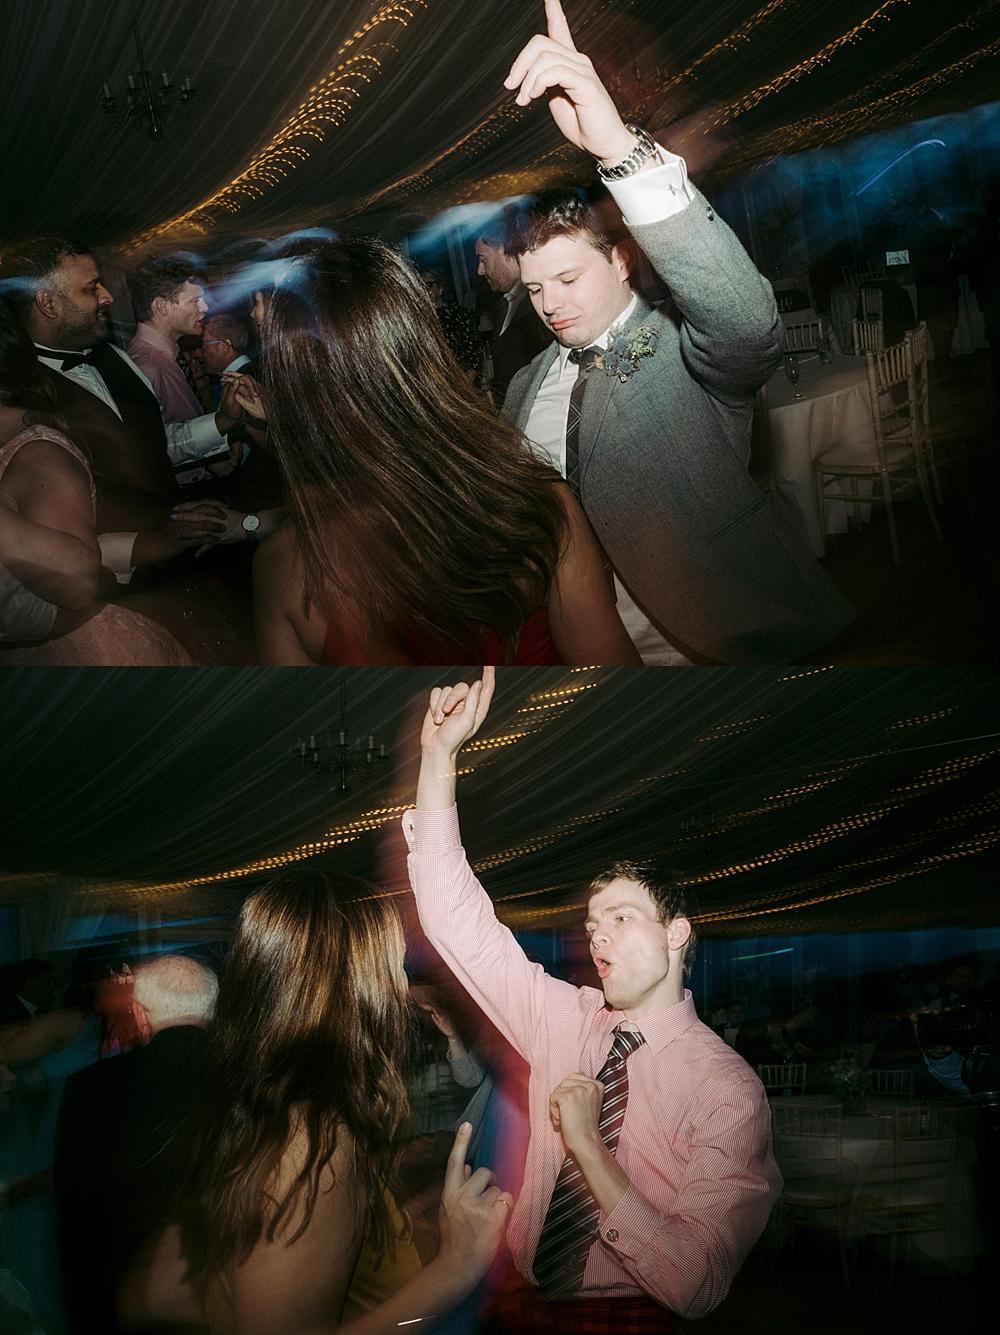 Fine Art Wedding Photographers,ayrshire wedding photographer,colourful wedding photographers,elegant wedding photographers glasgow,light and airy wedding photographers glasgow,light and bright wedding photographers scotland,natural wedding photographers,romantic photographers Scotland,soft wedding photographers,weddings loch lomond,